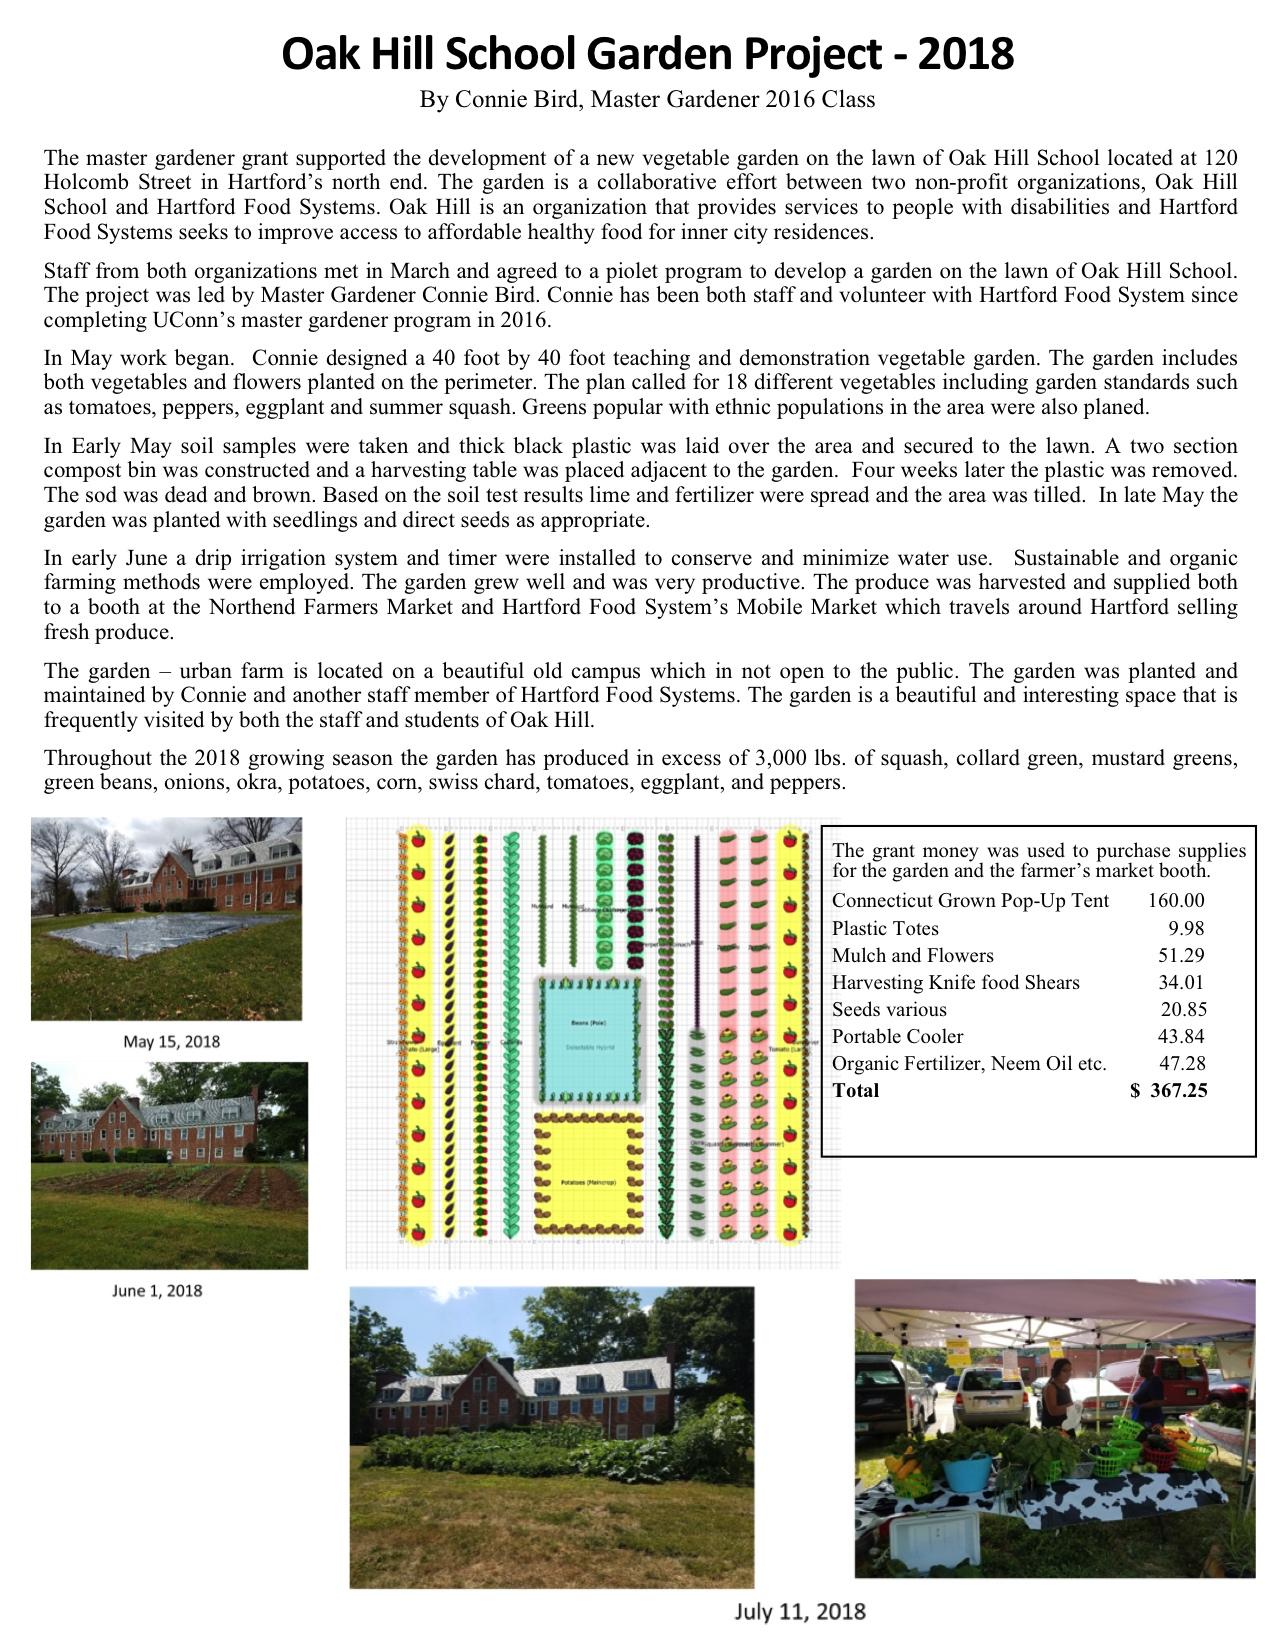 Oak Hill School Garden 2018.jpeg